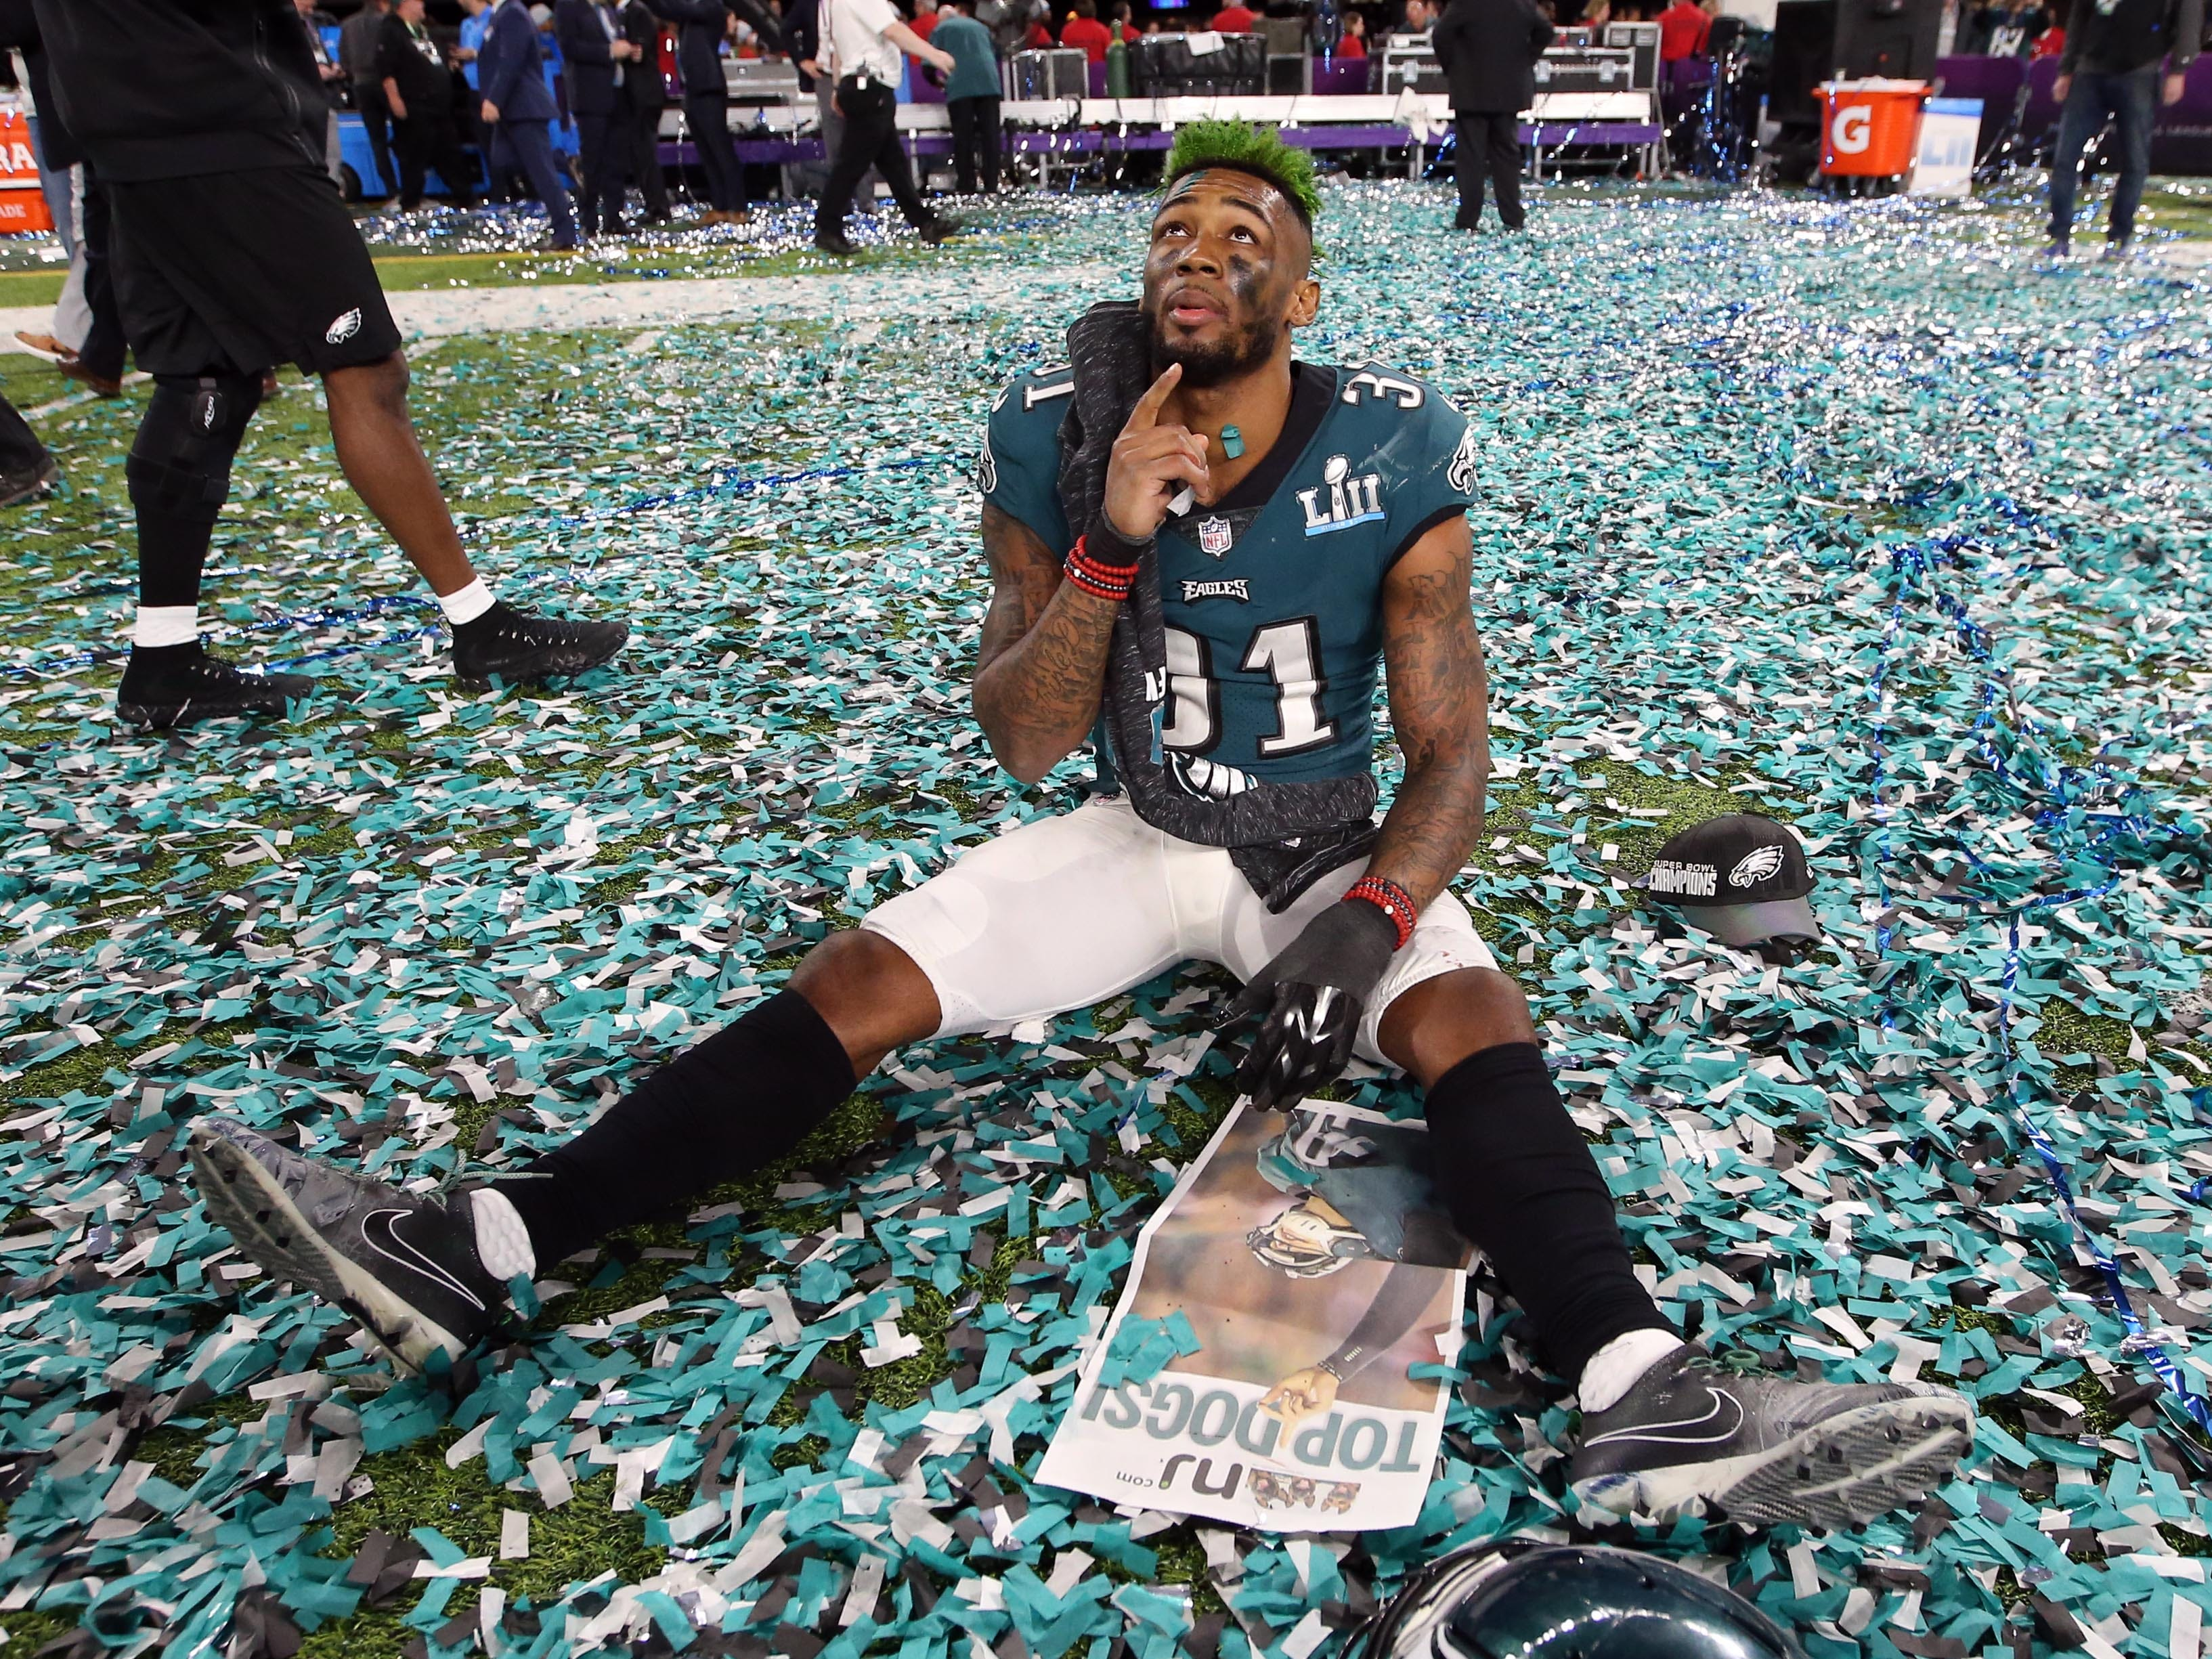 Feb. 4, 2018: Philadelphia Eagles cornerback Jalen Mills reacts after defeating the New England Patriots in Super Bowl LII at U.S. Bank Stadium in  Minneapolis, Minn.